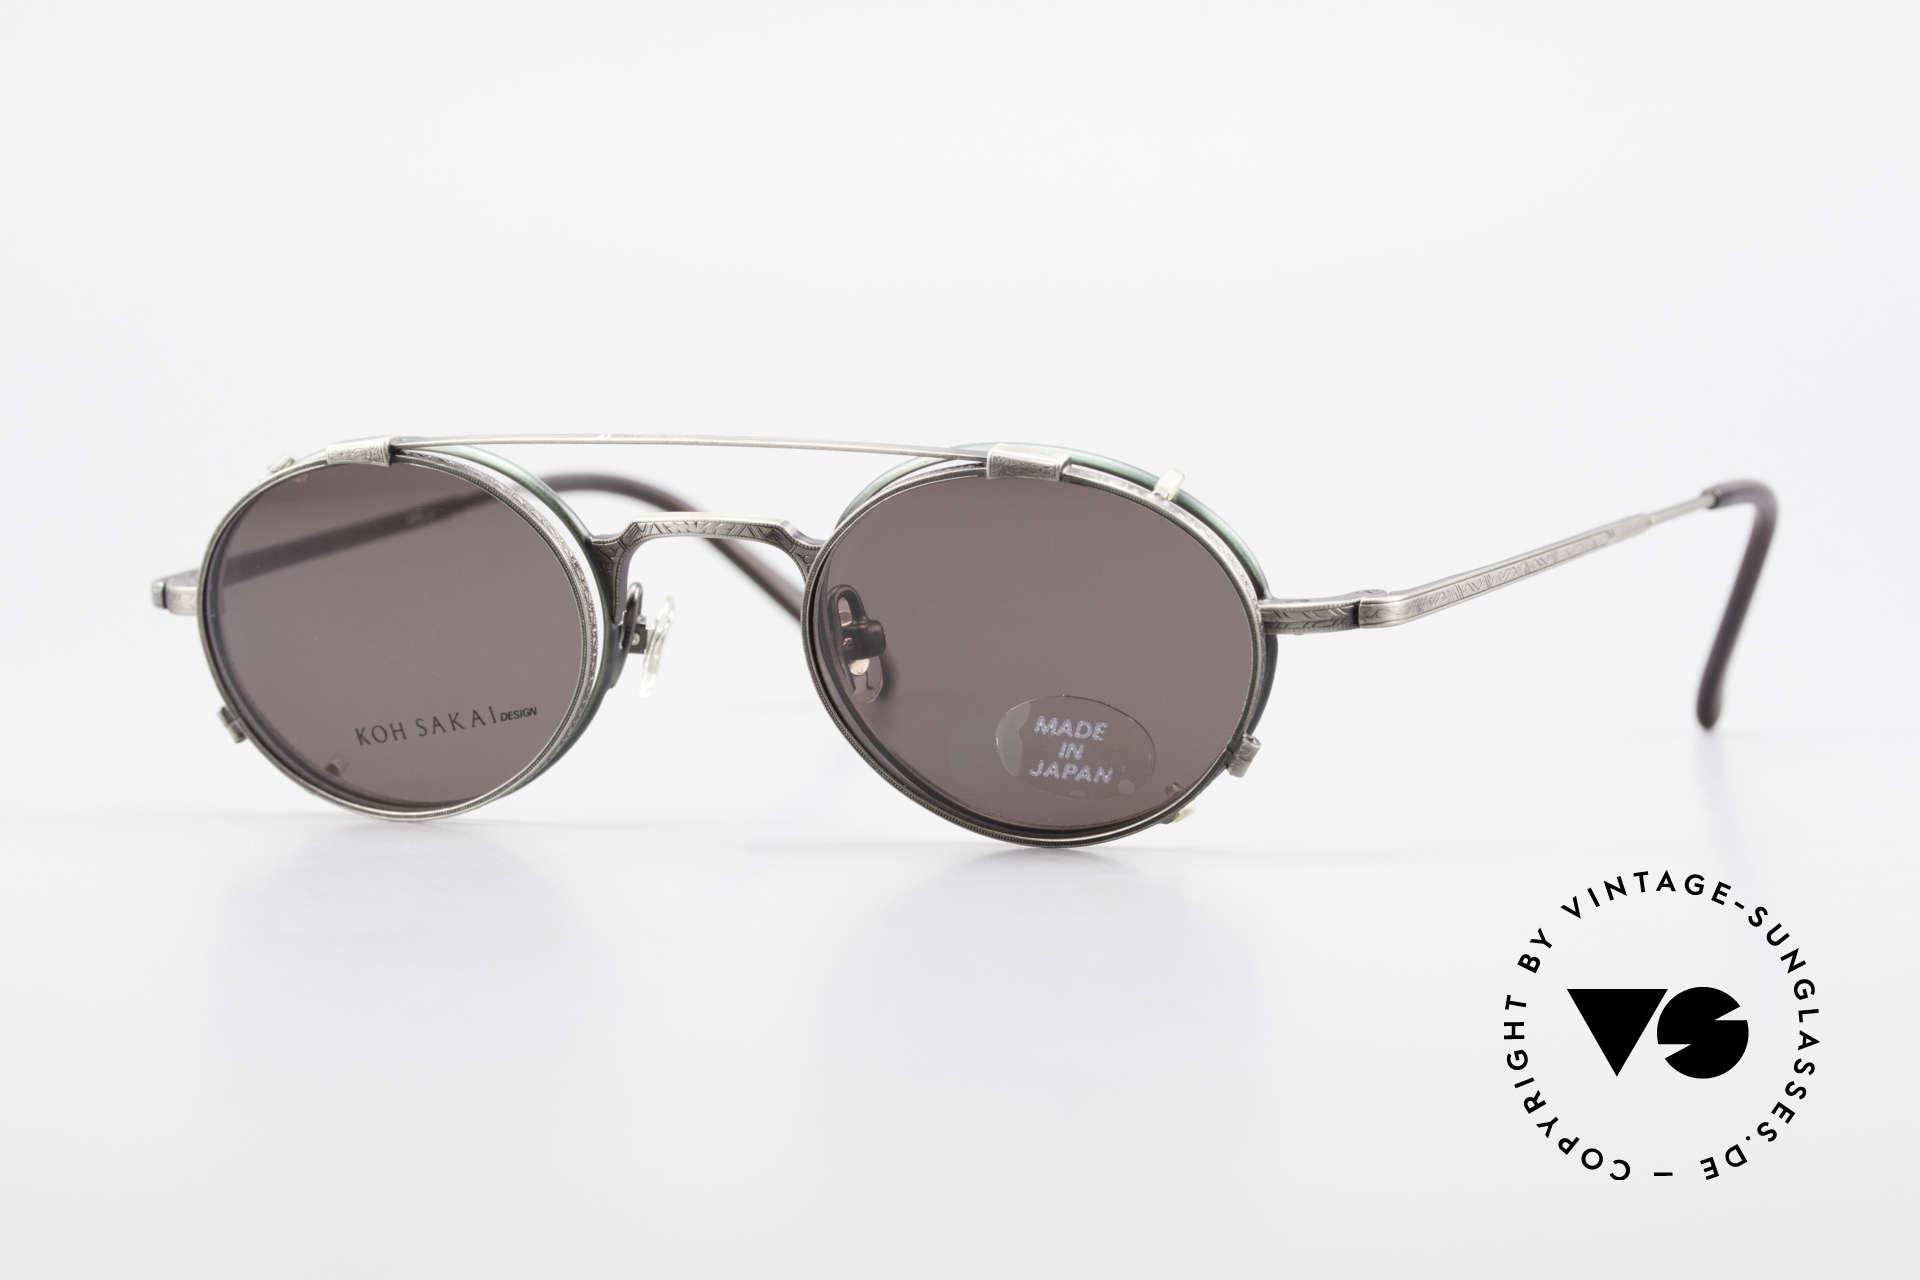 Koh Sakai KS9301 90s Oliver Peoples Eyevan Style, rare, vintage Koh Sakai glasses with clip-on from 1997, Made for Men